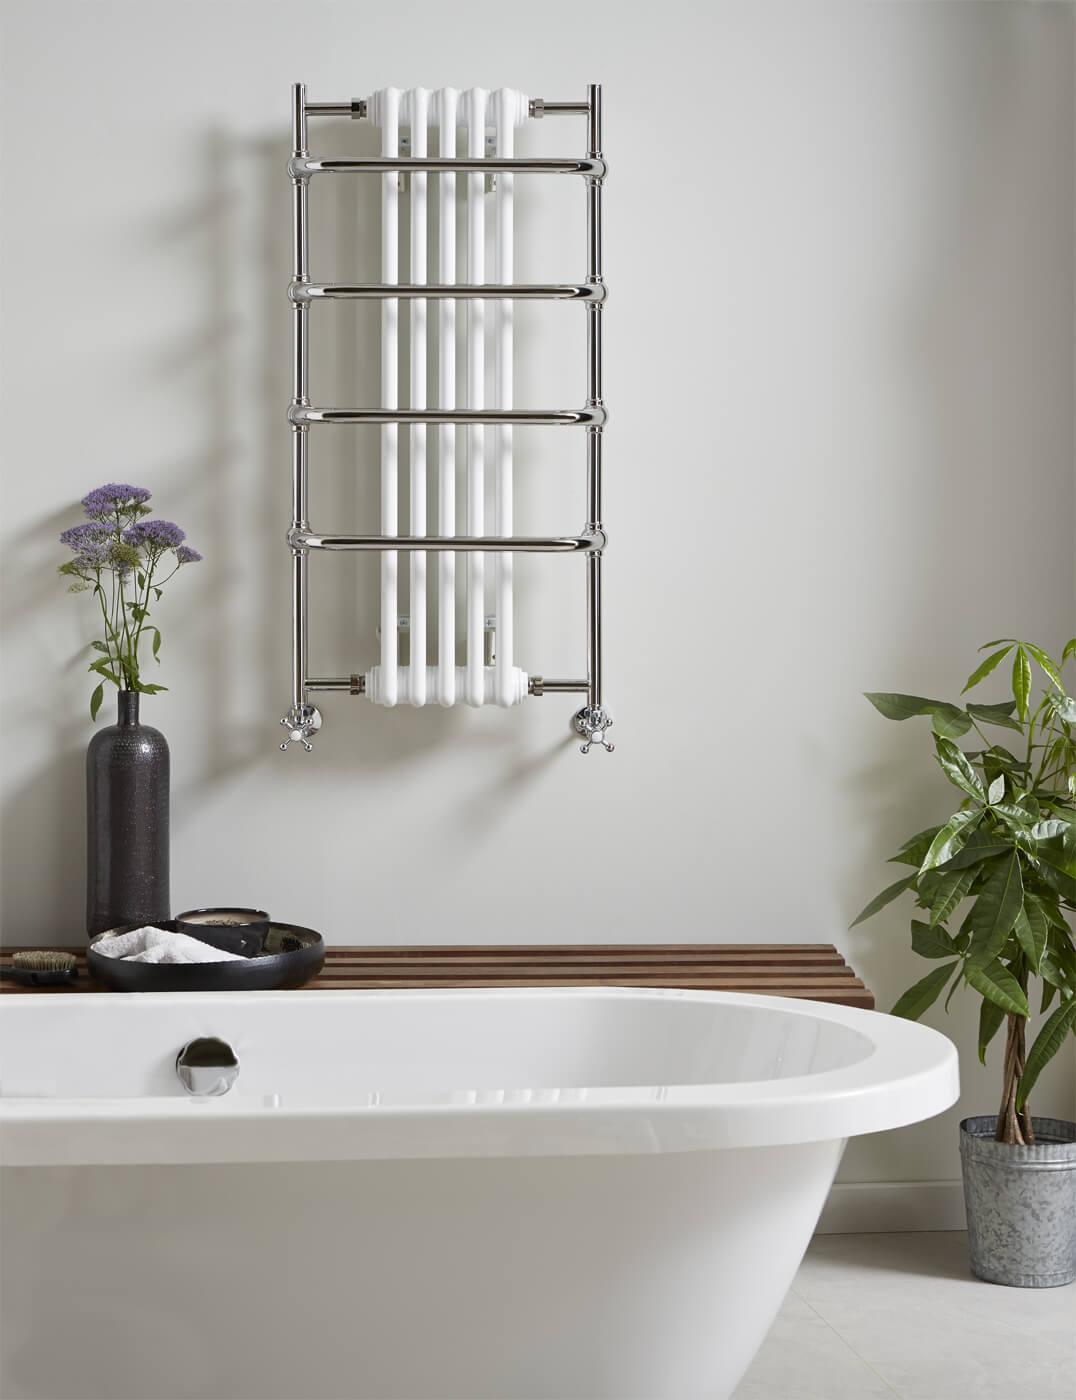 Vogue Sequel V 525 x 1000mm Traditional Towel Rail - TM006